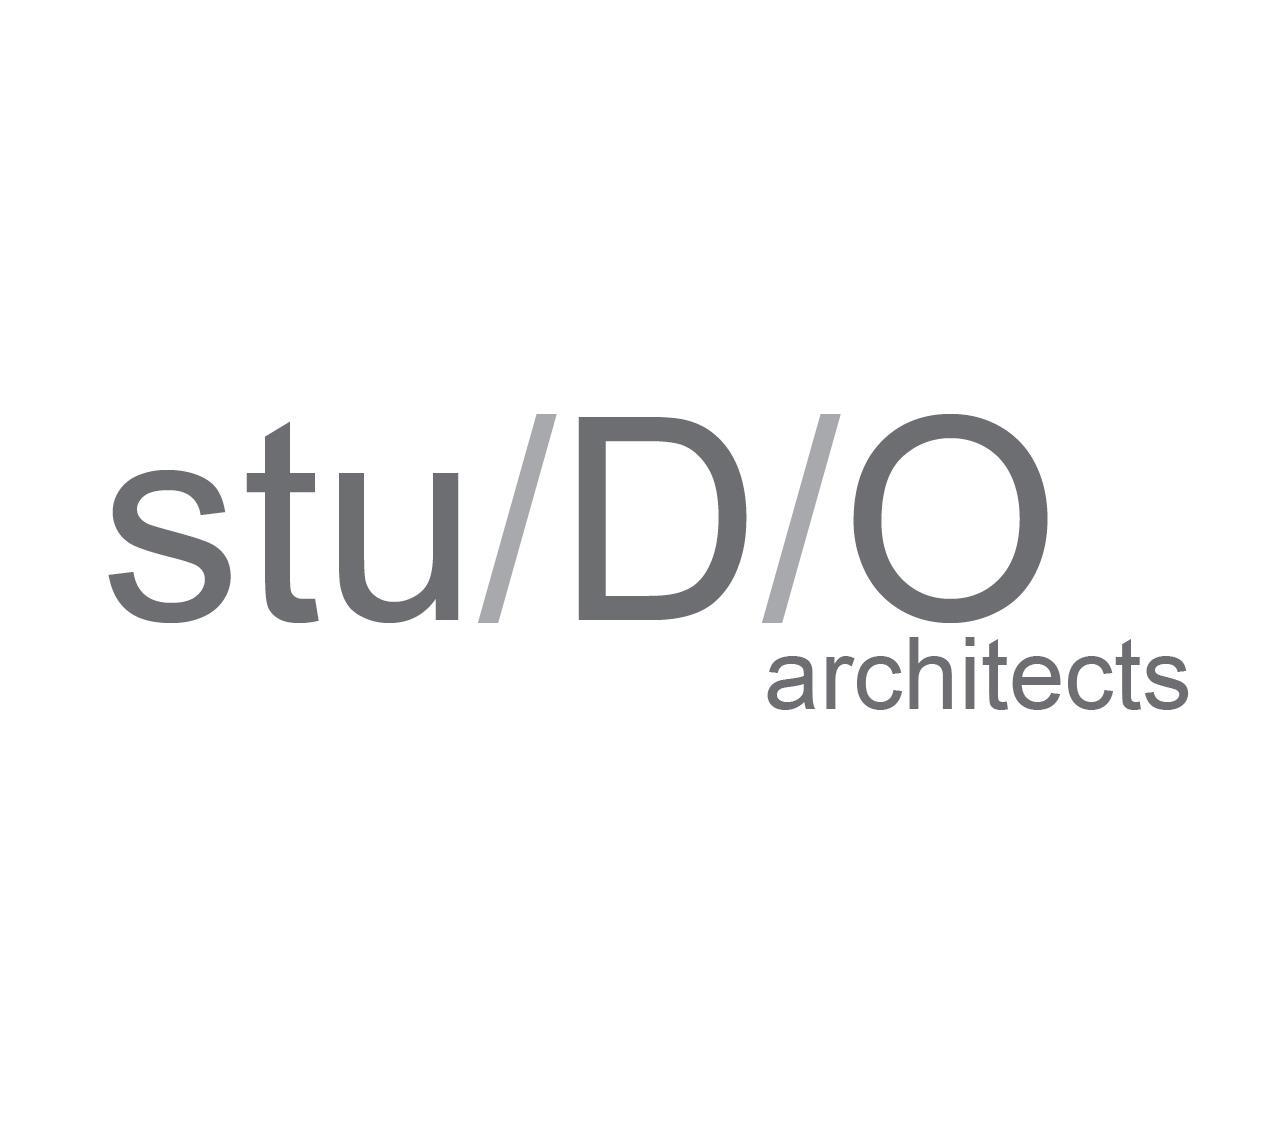 stu d o architects architectural design company based in bangkok